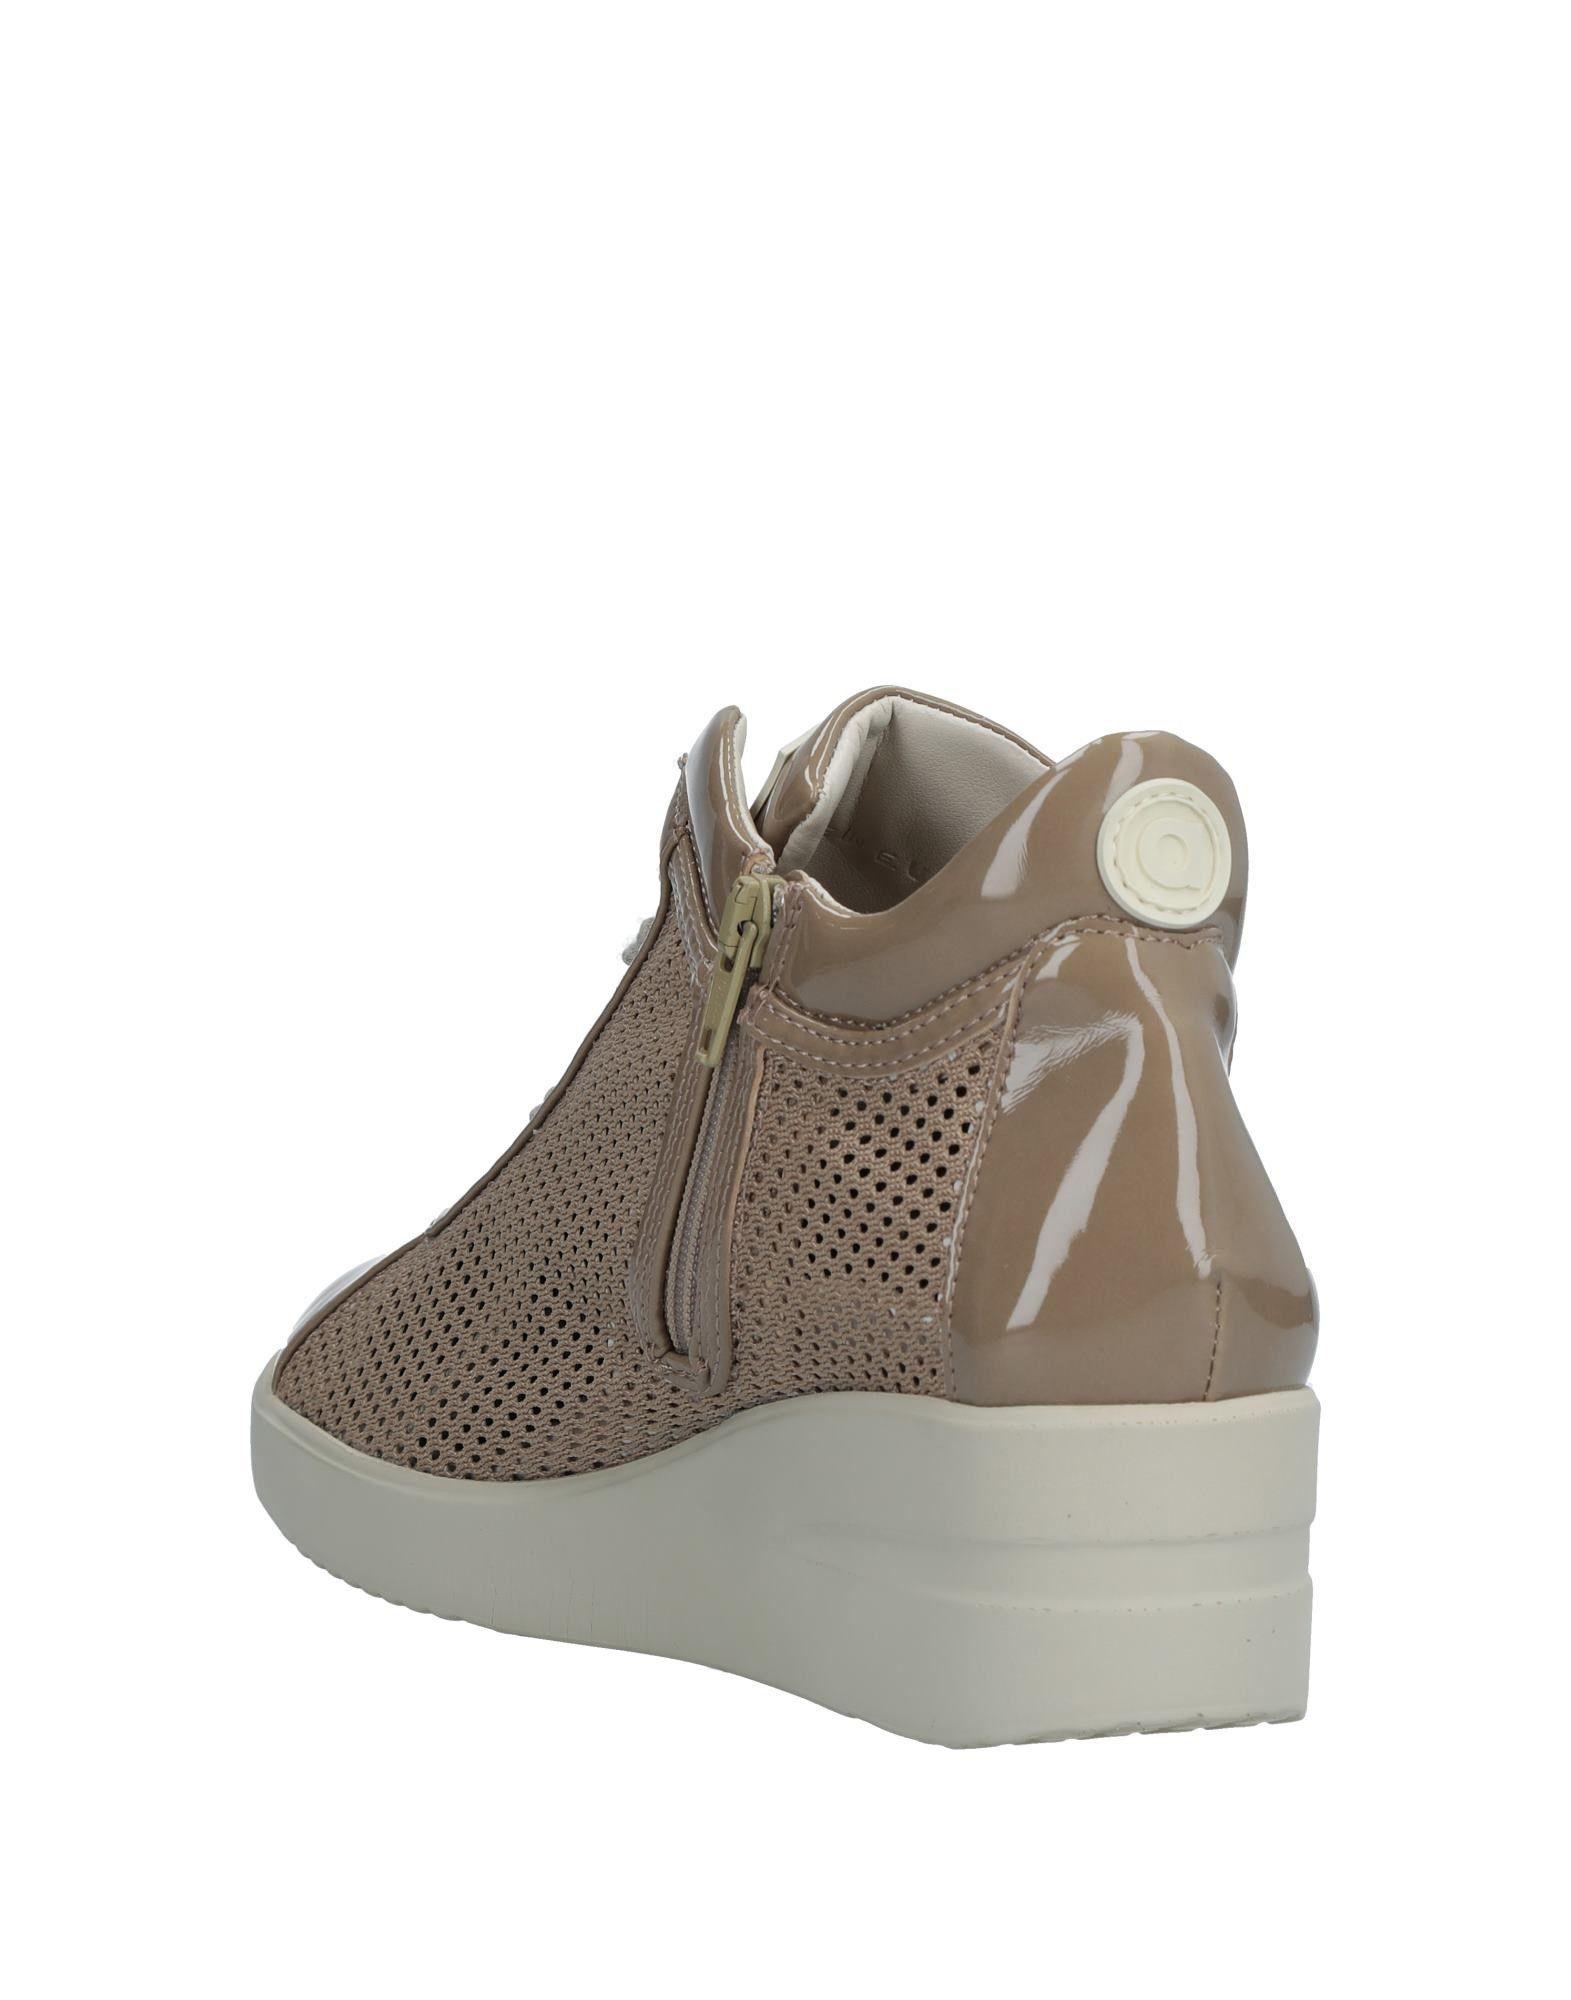 Agile By Rucoline Sneakers Damen beliebte  11507364GF Gute Qualität beliebte Damen Schuhe b595aa